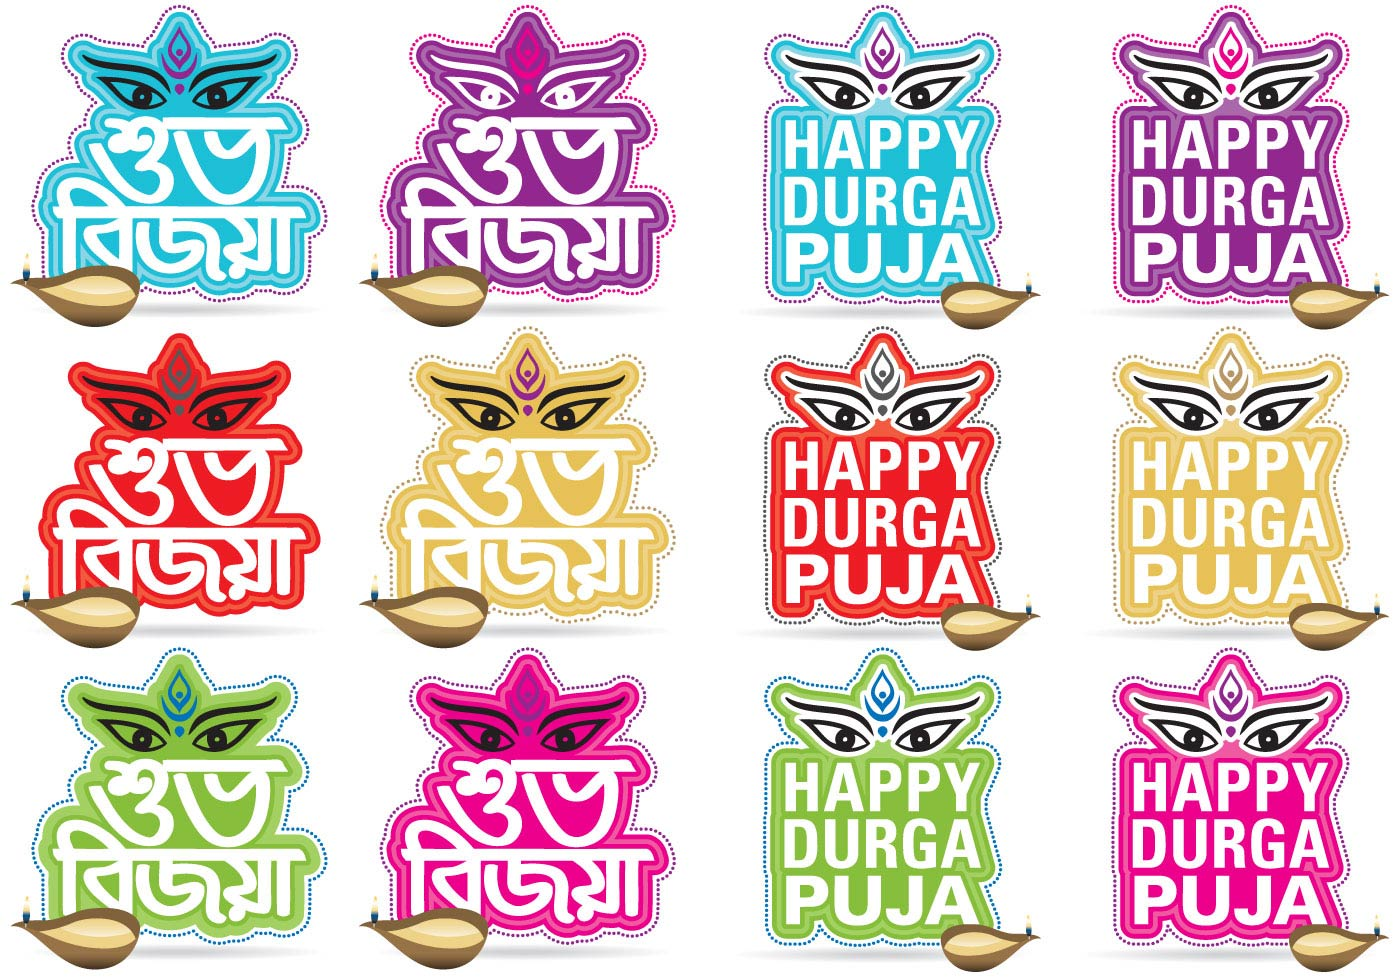 Durga Puja Free Vector Art 2687 Free Downloads